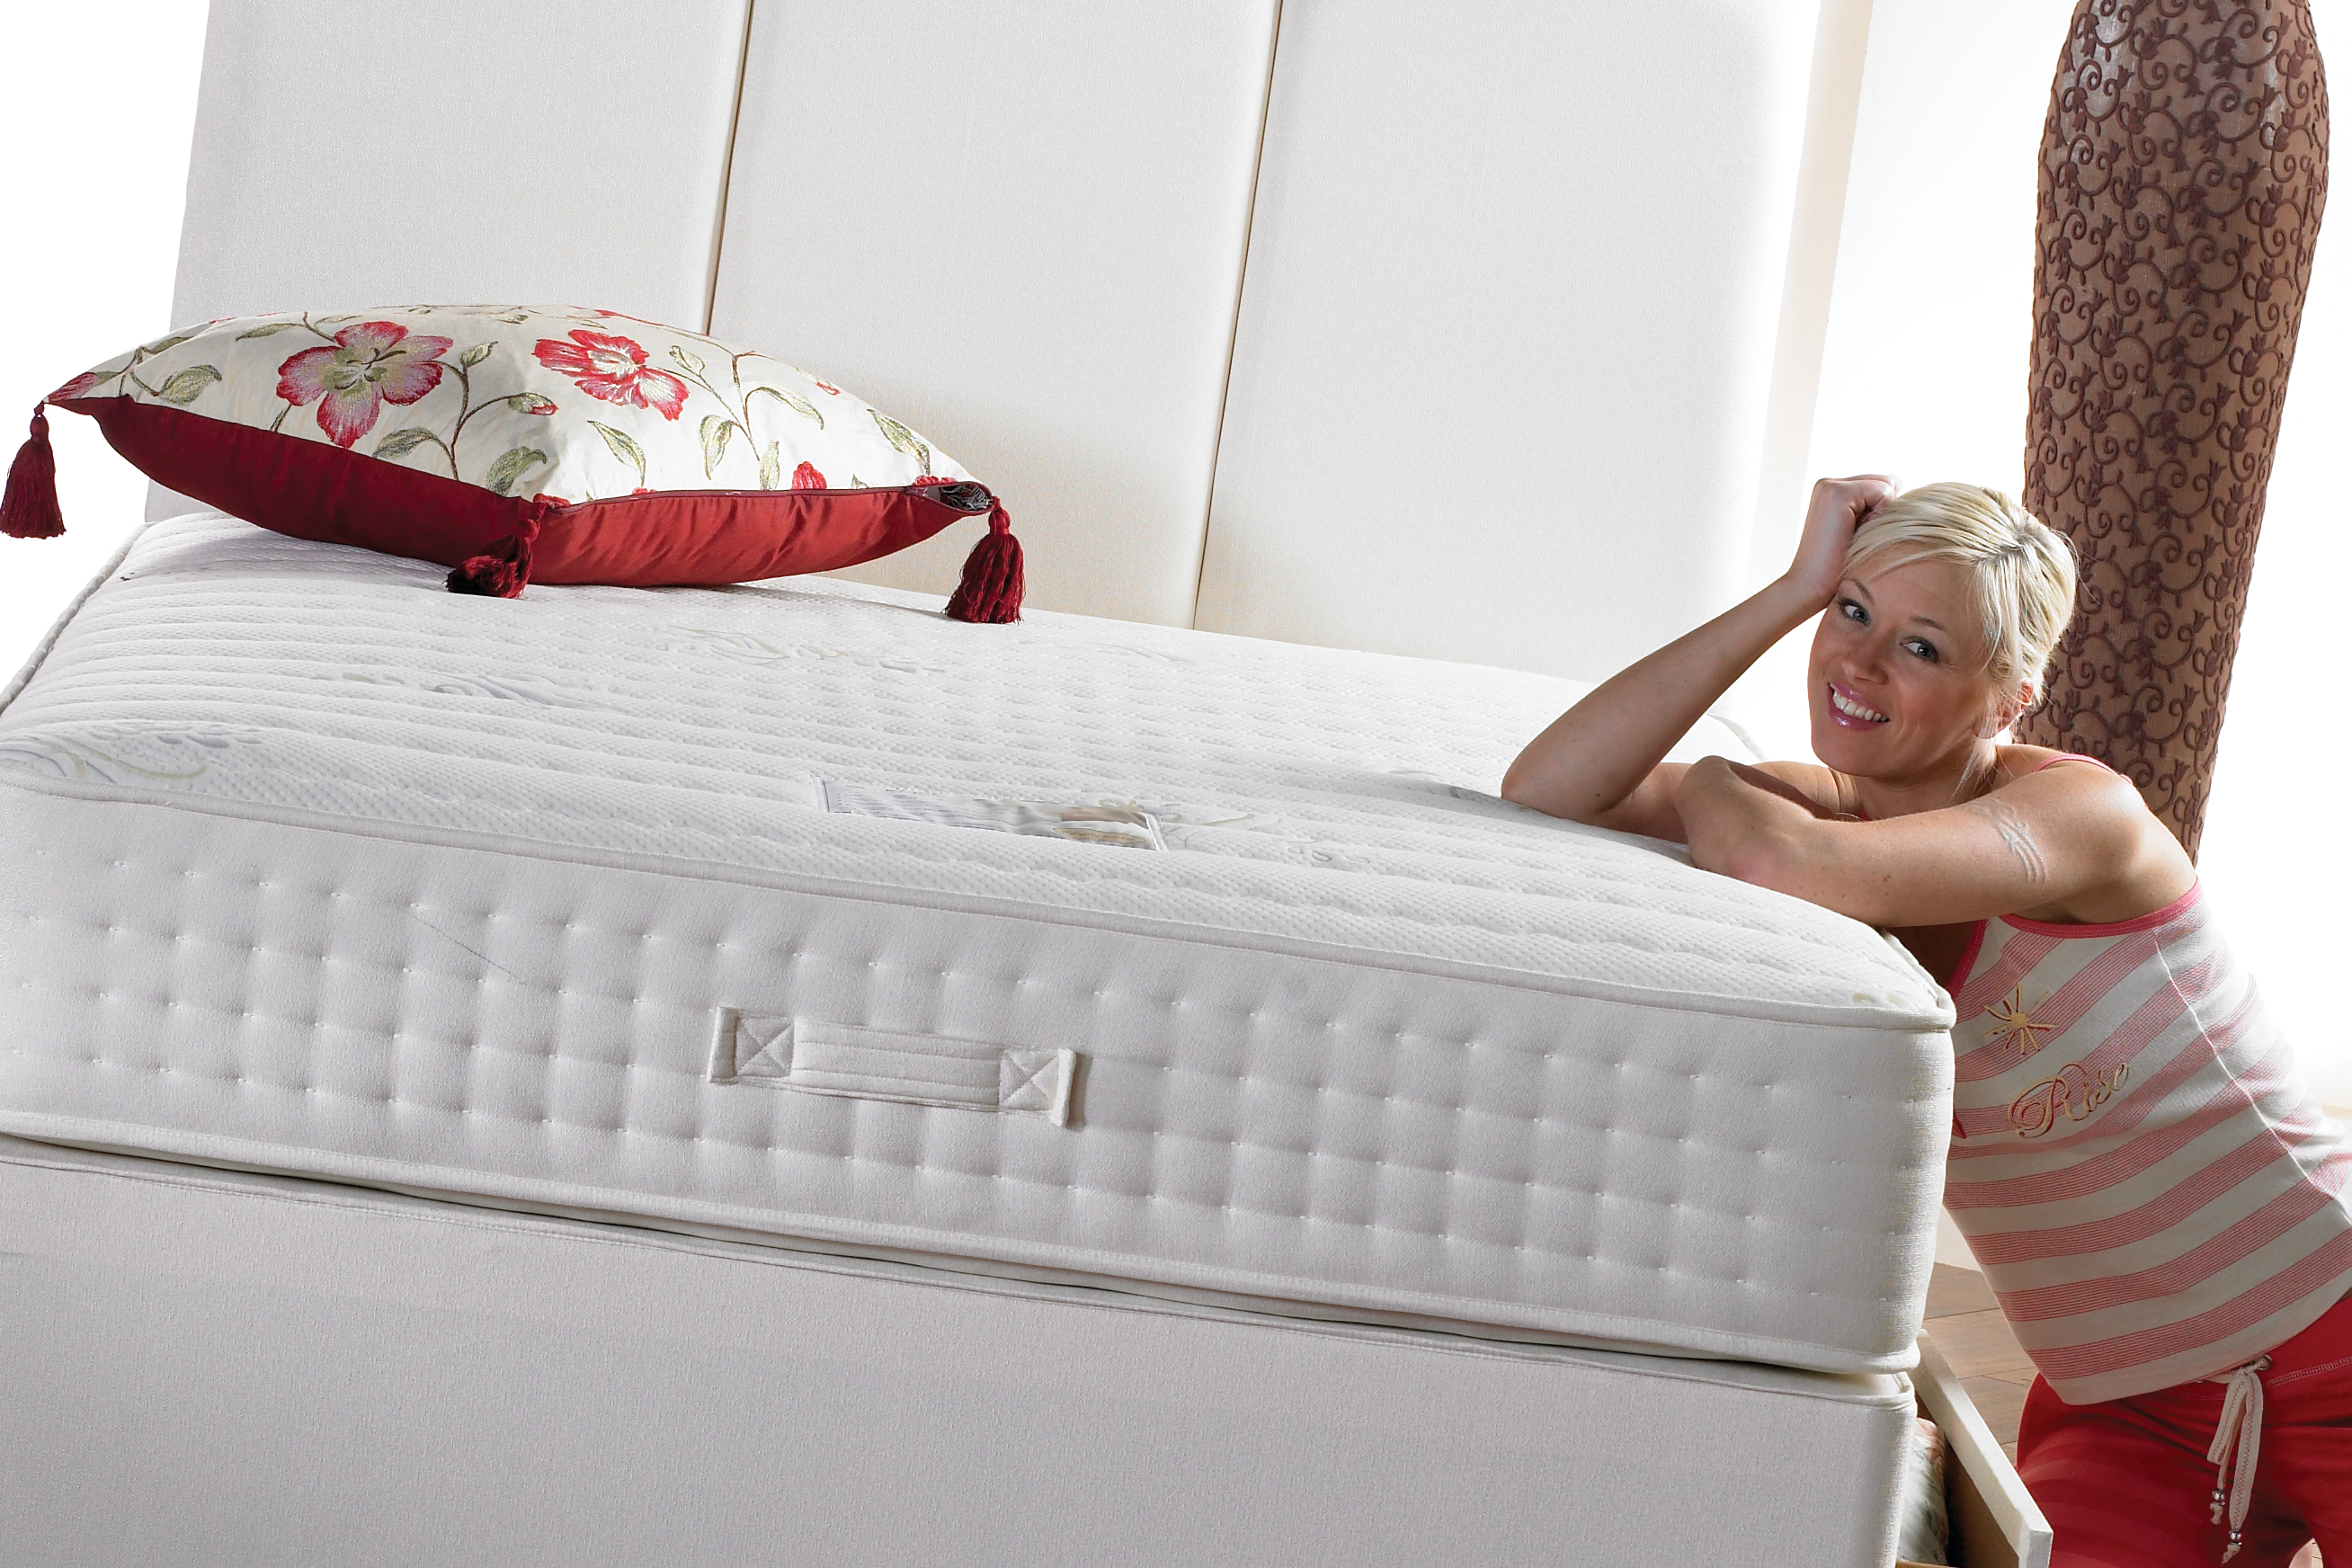 Как американские домохозяйки чистят матрасы за 3 простых шага